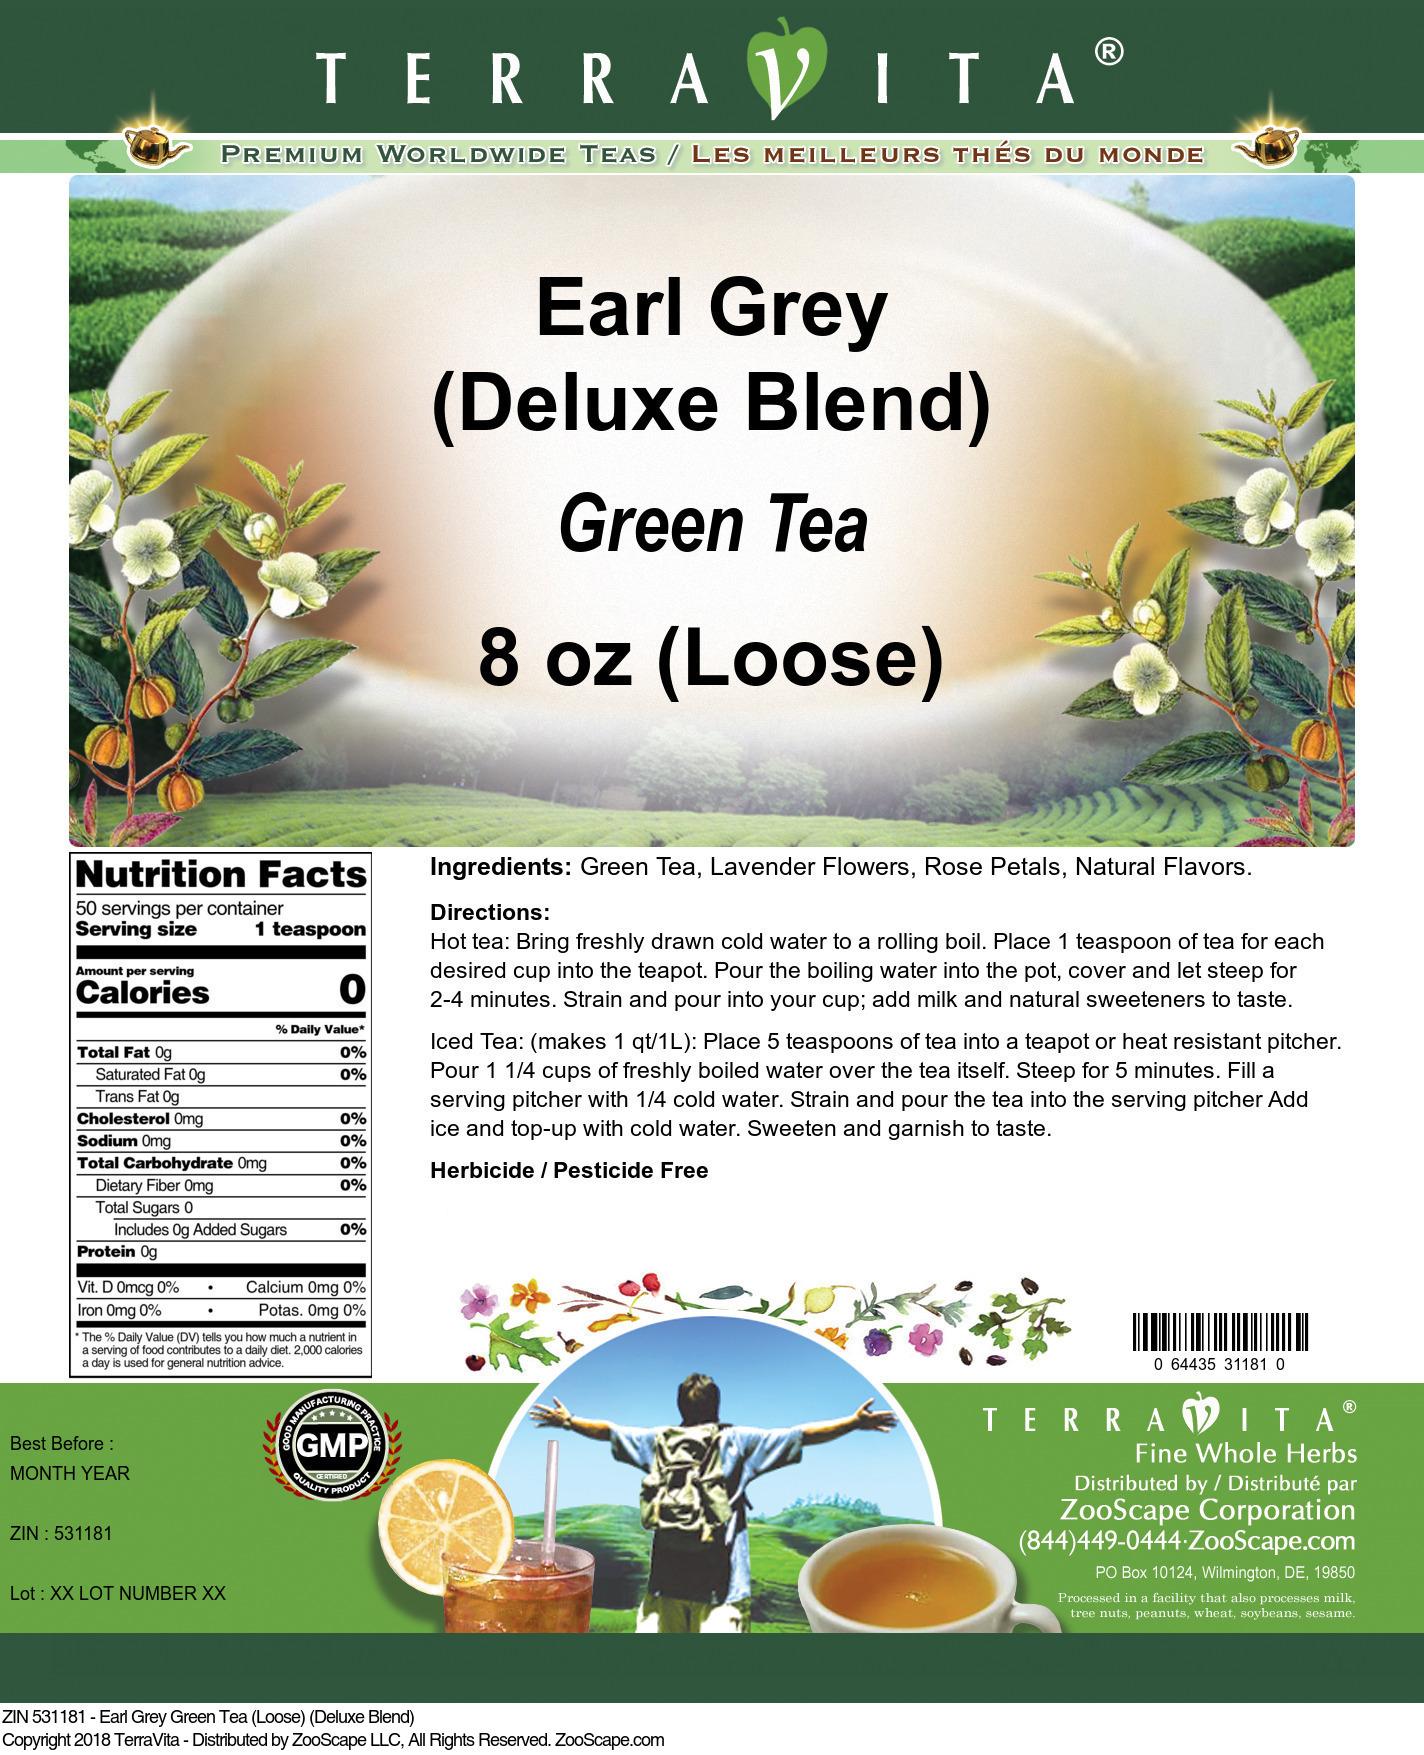 Earl Grey Green Tea (Loose) (Deluxe Blend)